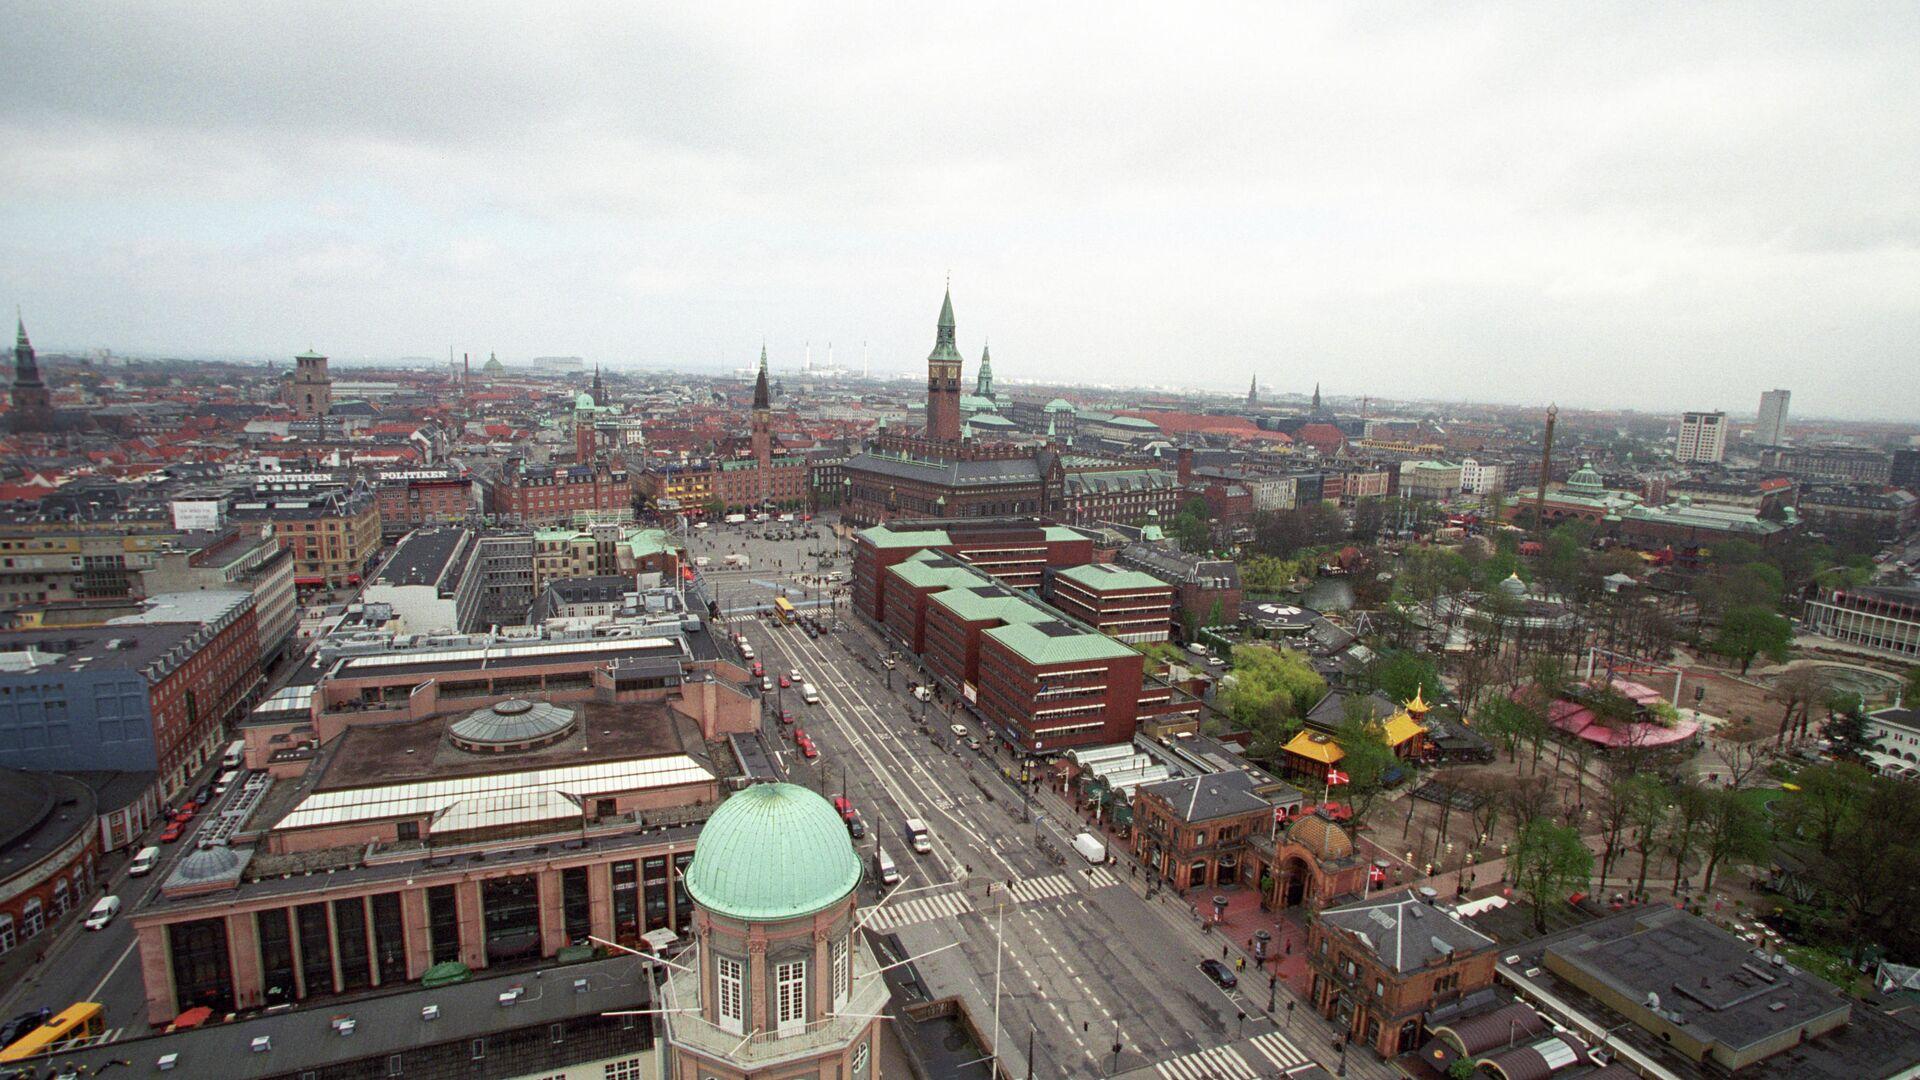 Центр города Копенгаген - РИА Новости, 1920, 14.01.2021